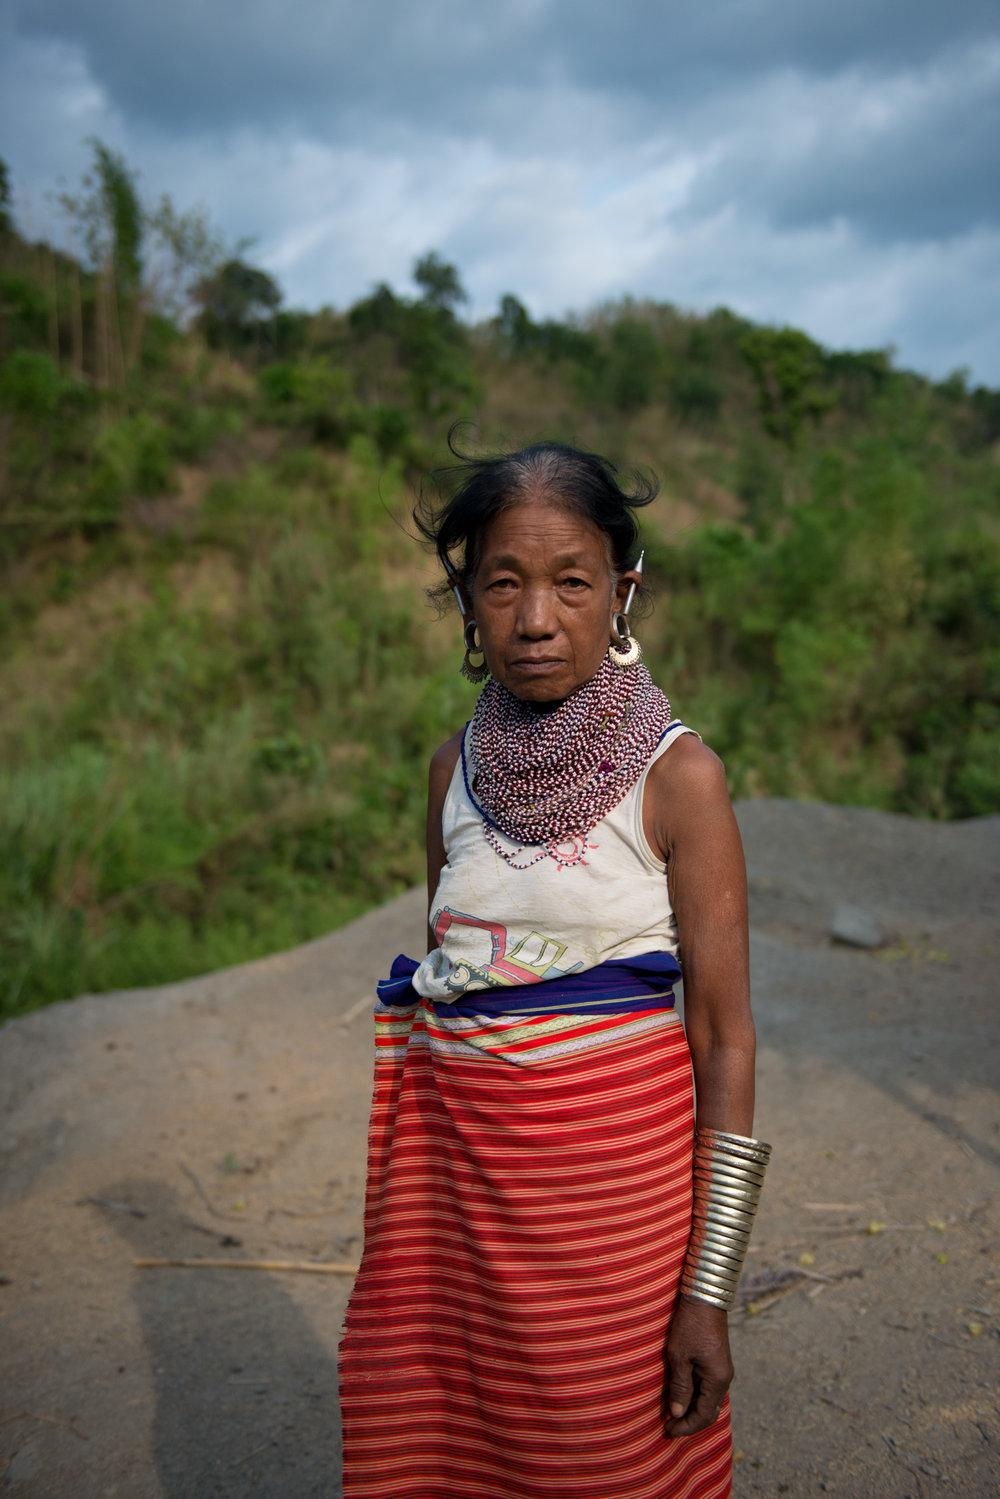 11_Chhandak Pradhan-Reportage-The_Promise_of_Asphalt-Border_road_NE India_Burma_Le Monde.jpg